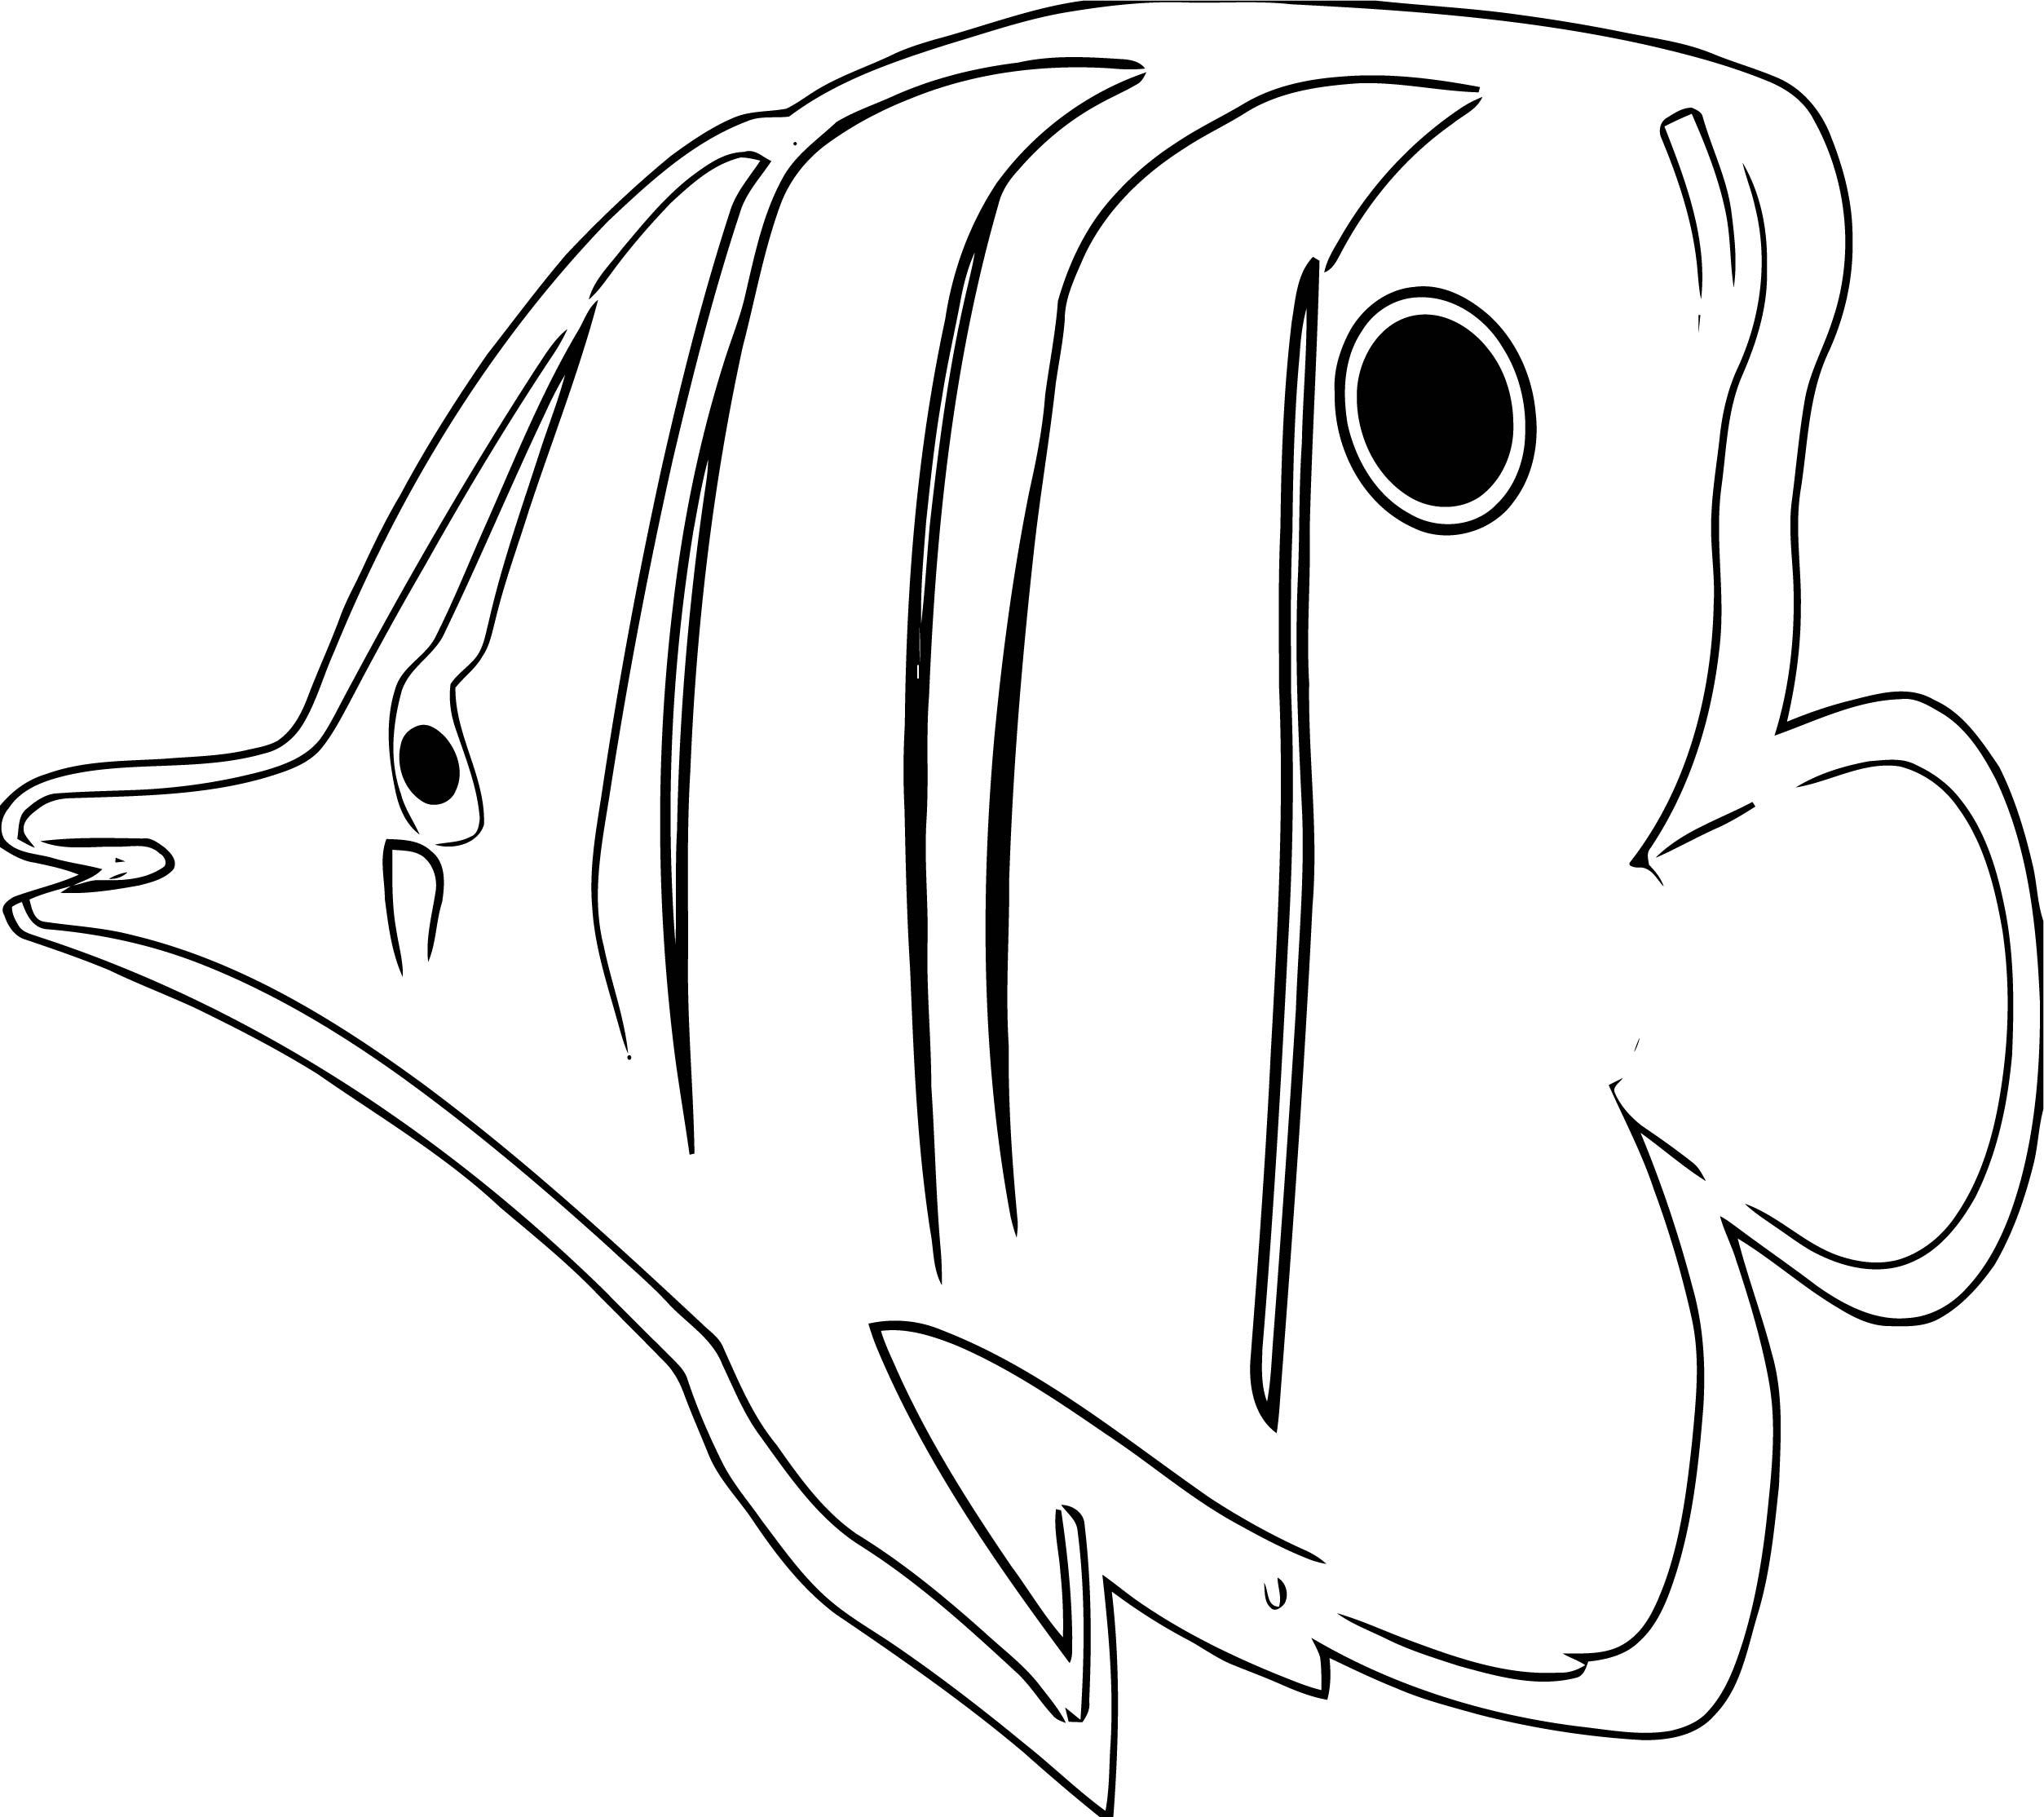 Fish Coloring Page WeColoringPage 109 | Wecoloringpage.com